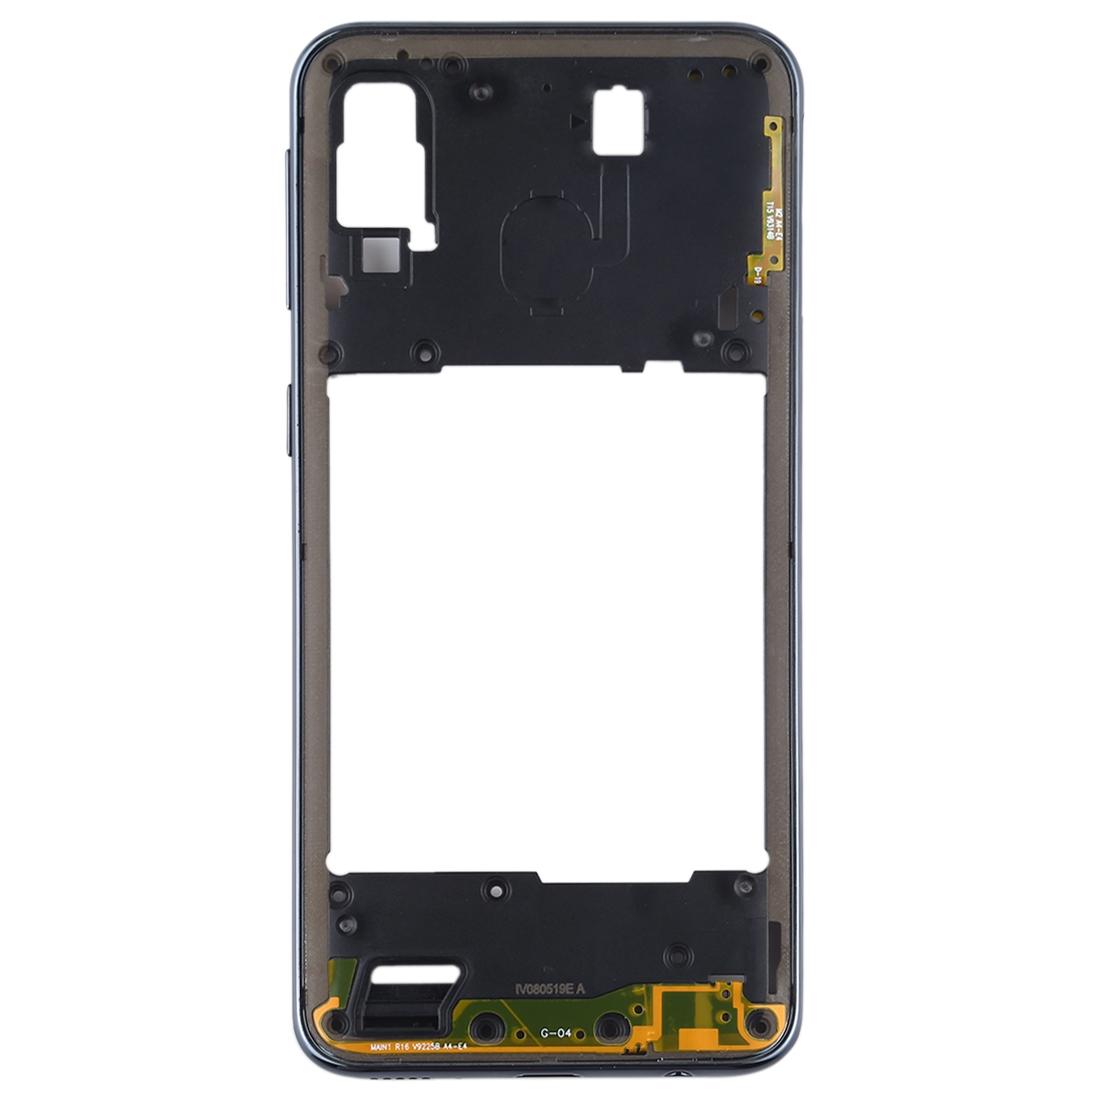 Carcasa intermedia para Samsung Galaxy A40 A405F – Negro